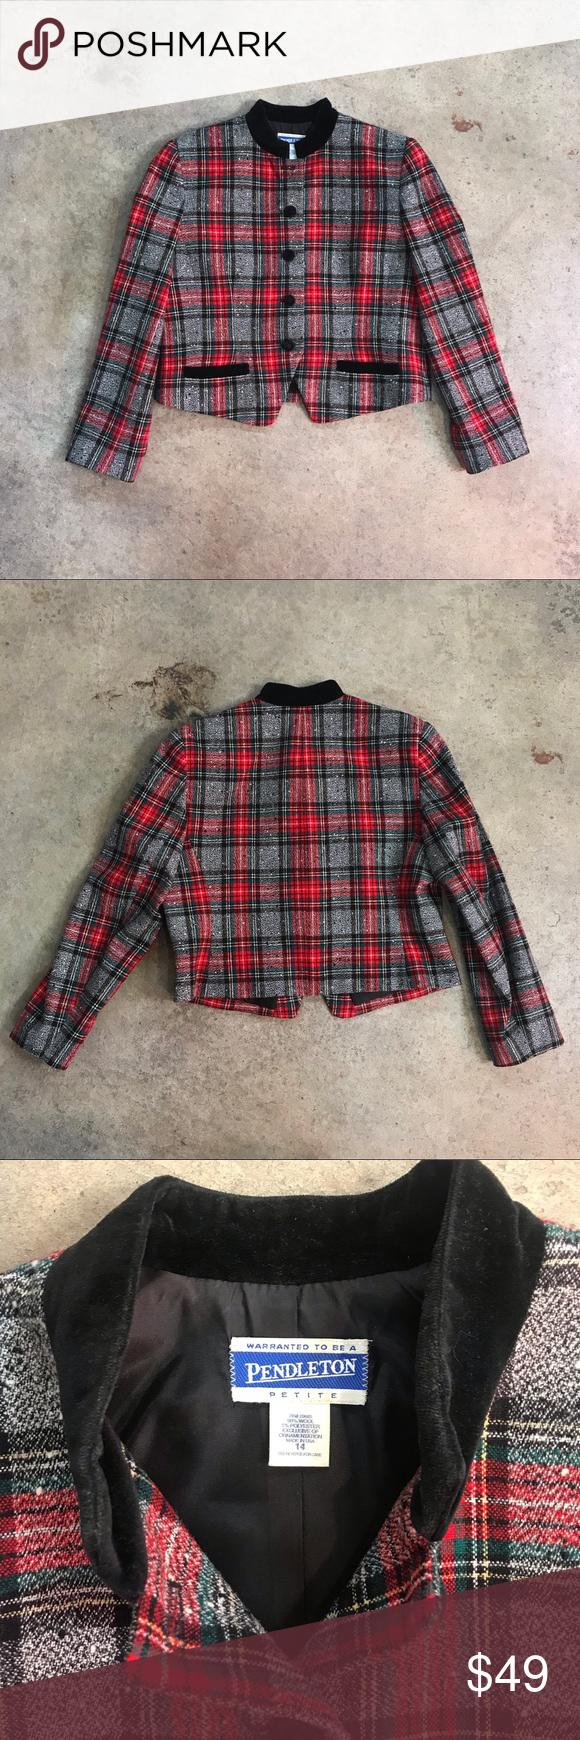 Vintage 1990s Stitches Australia Ladies Jacket Houndstooth Fabric Size 18